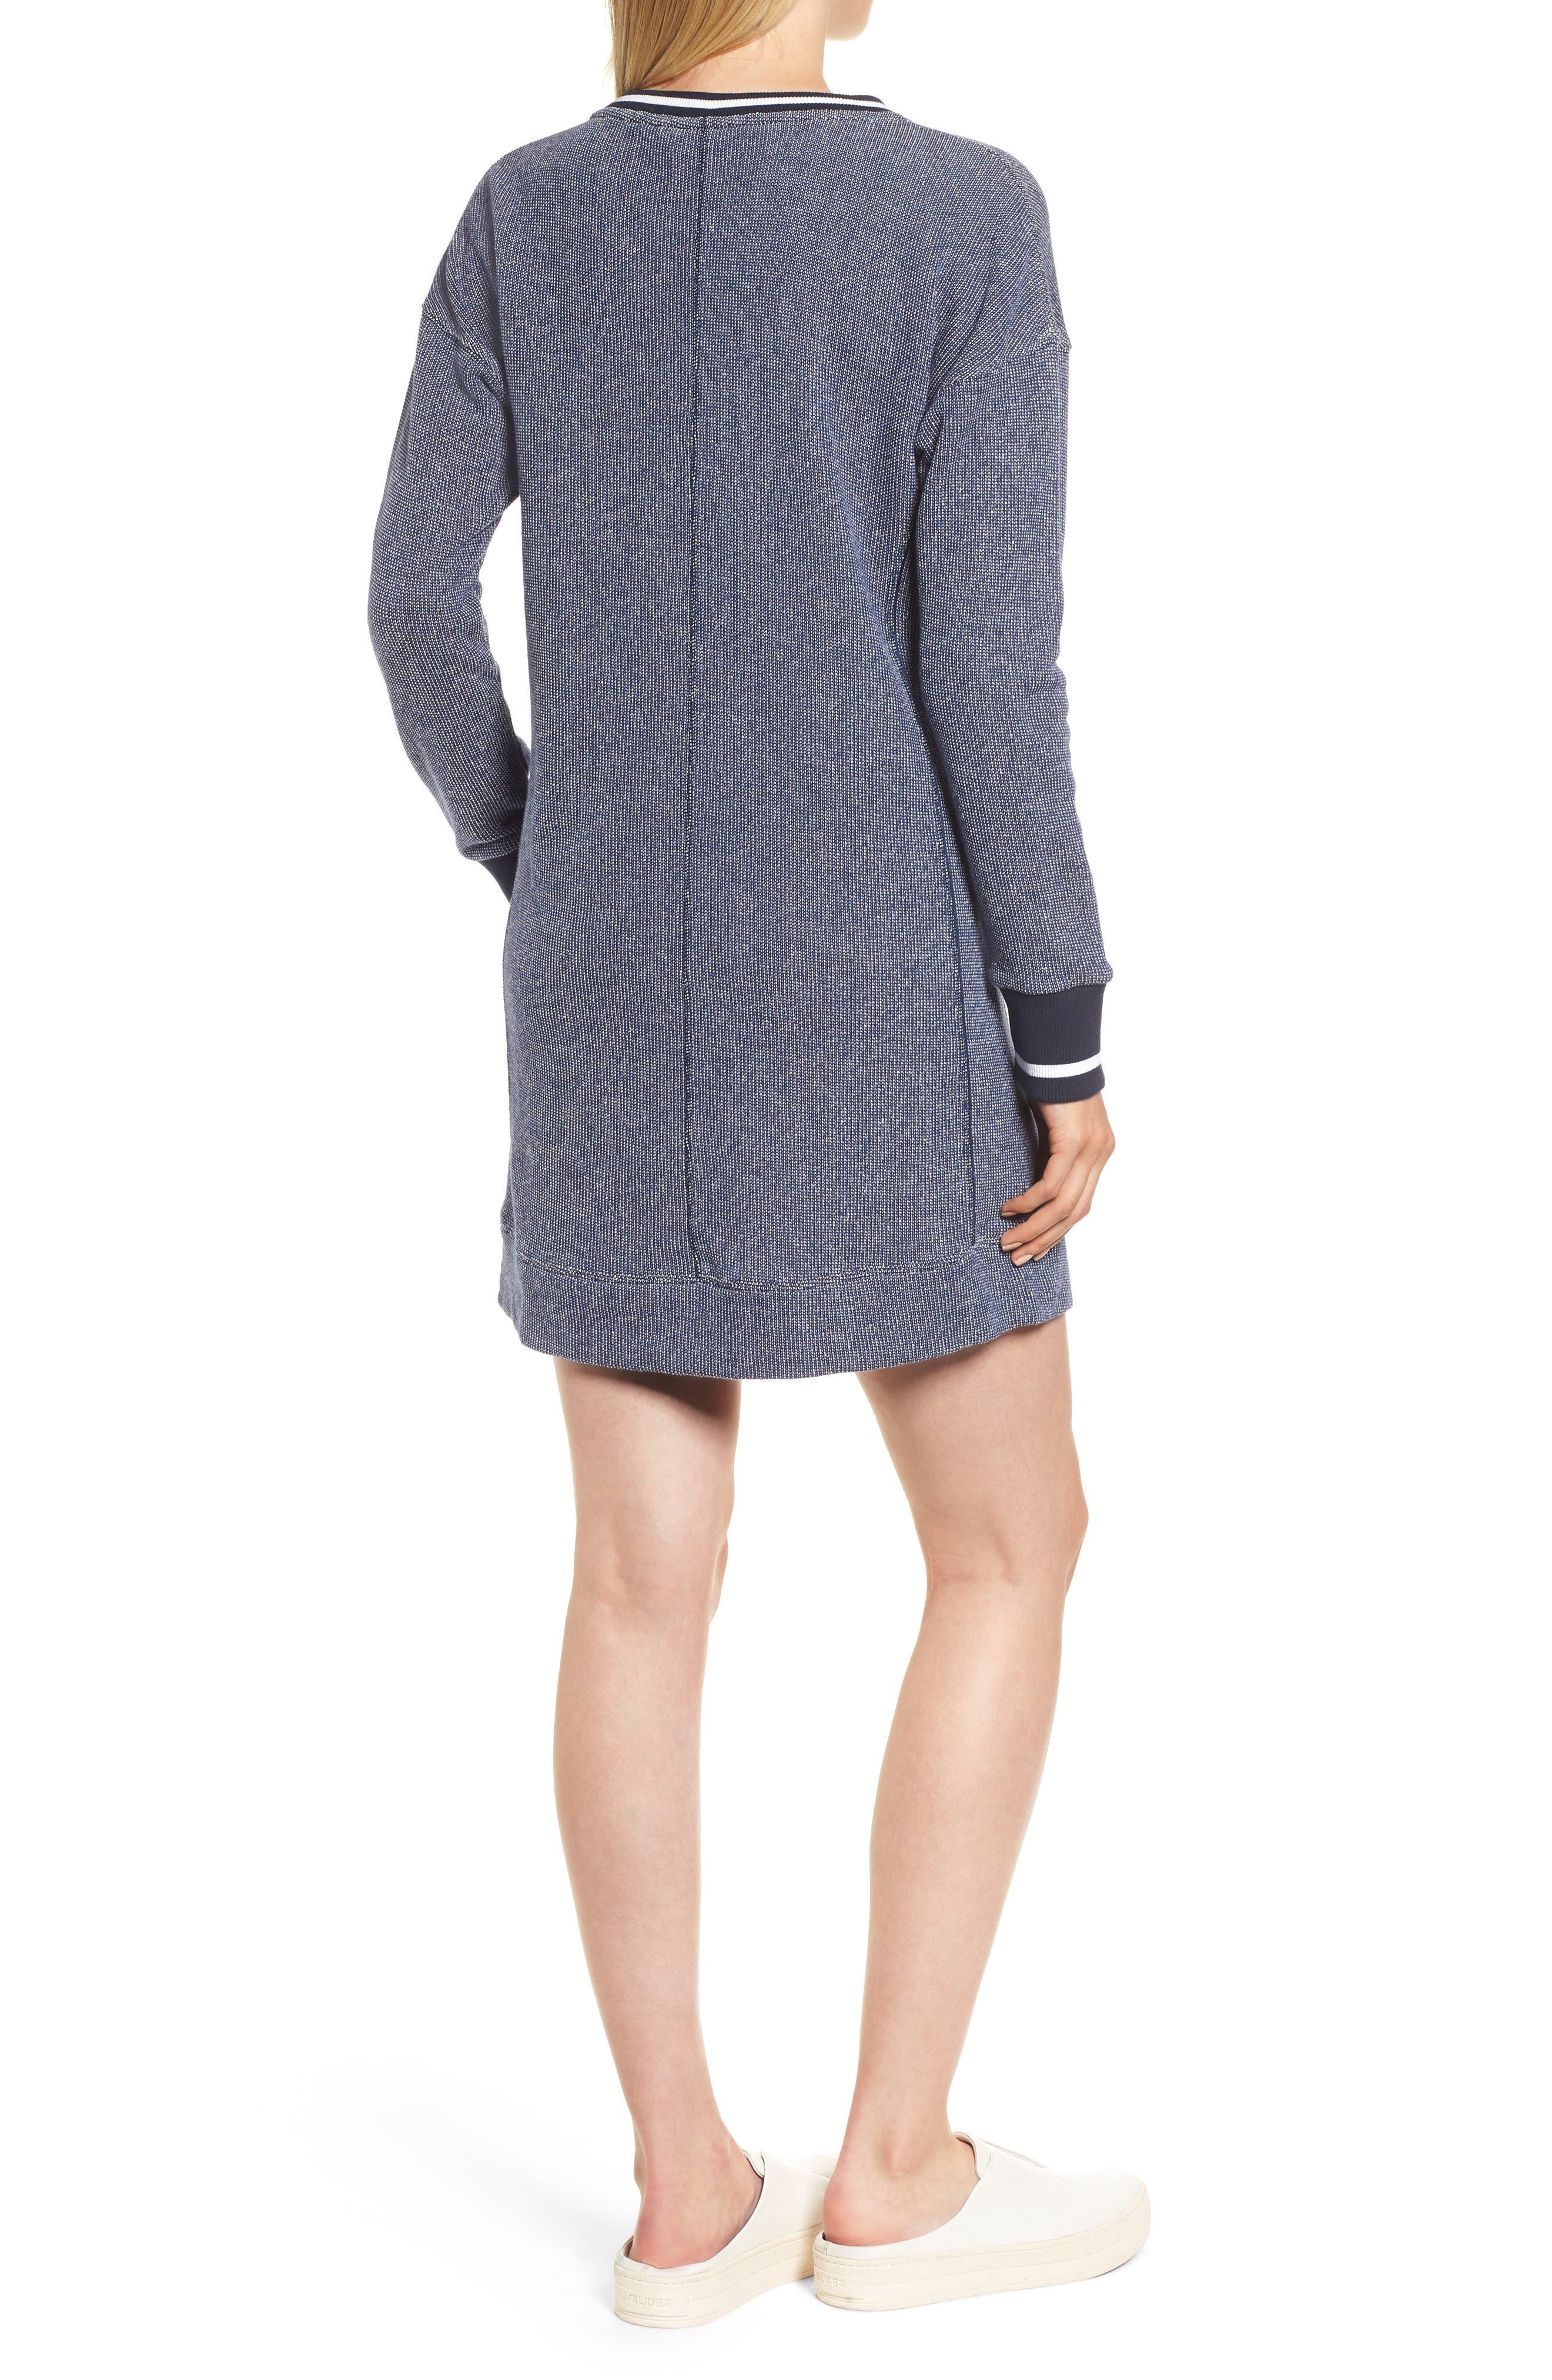 Sweatshirt Dress,                             Alternate thumbnail 2, color,                             476